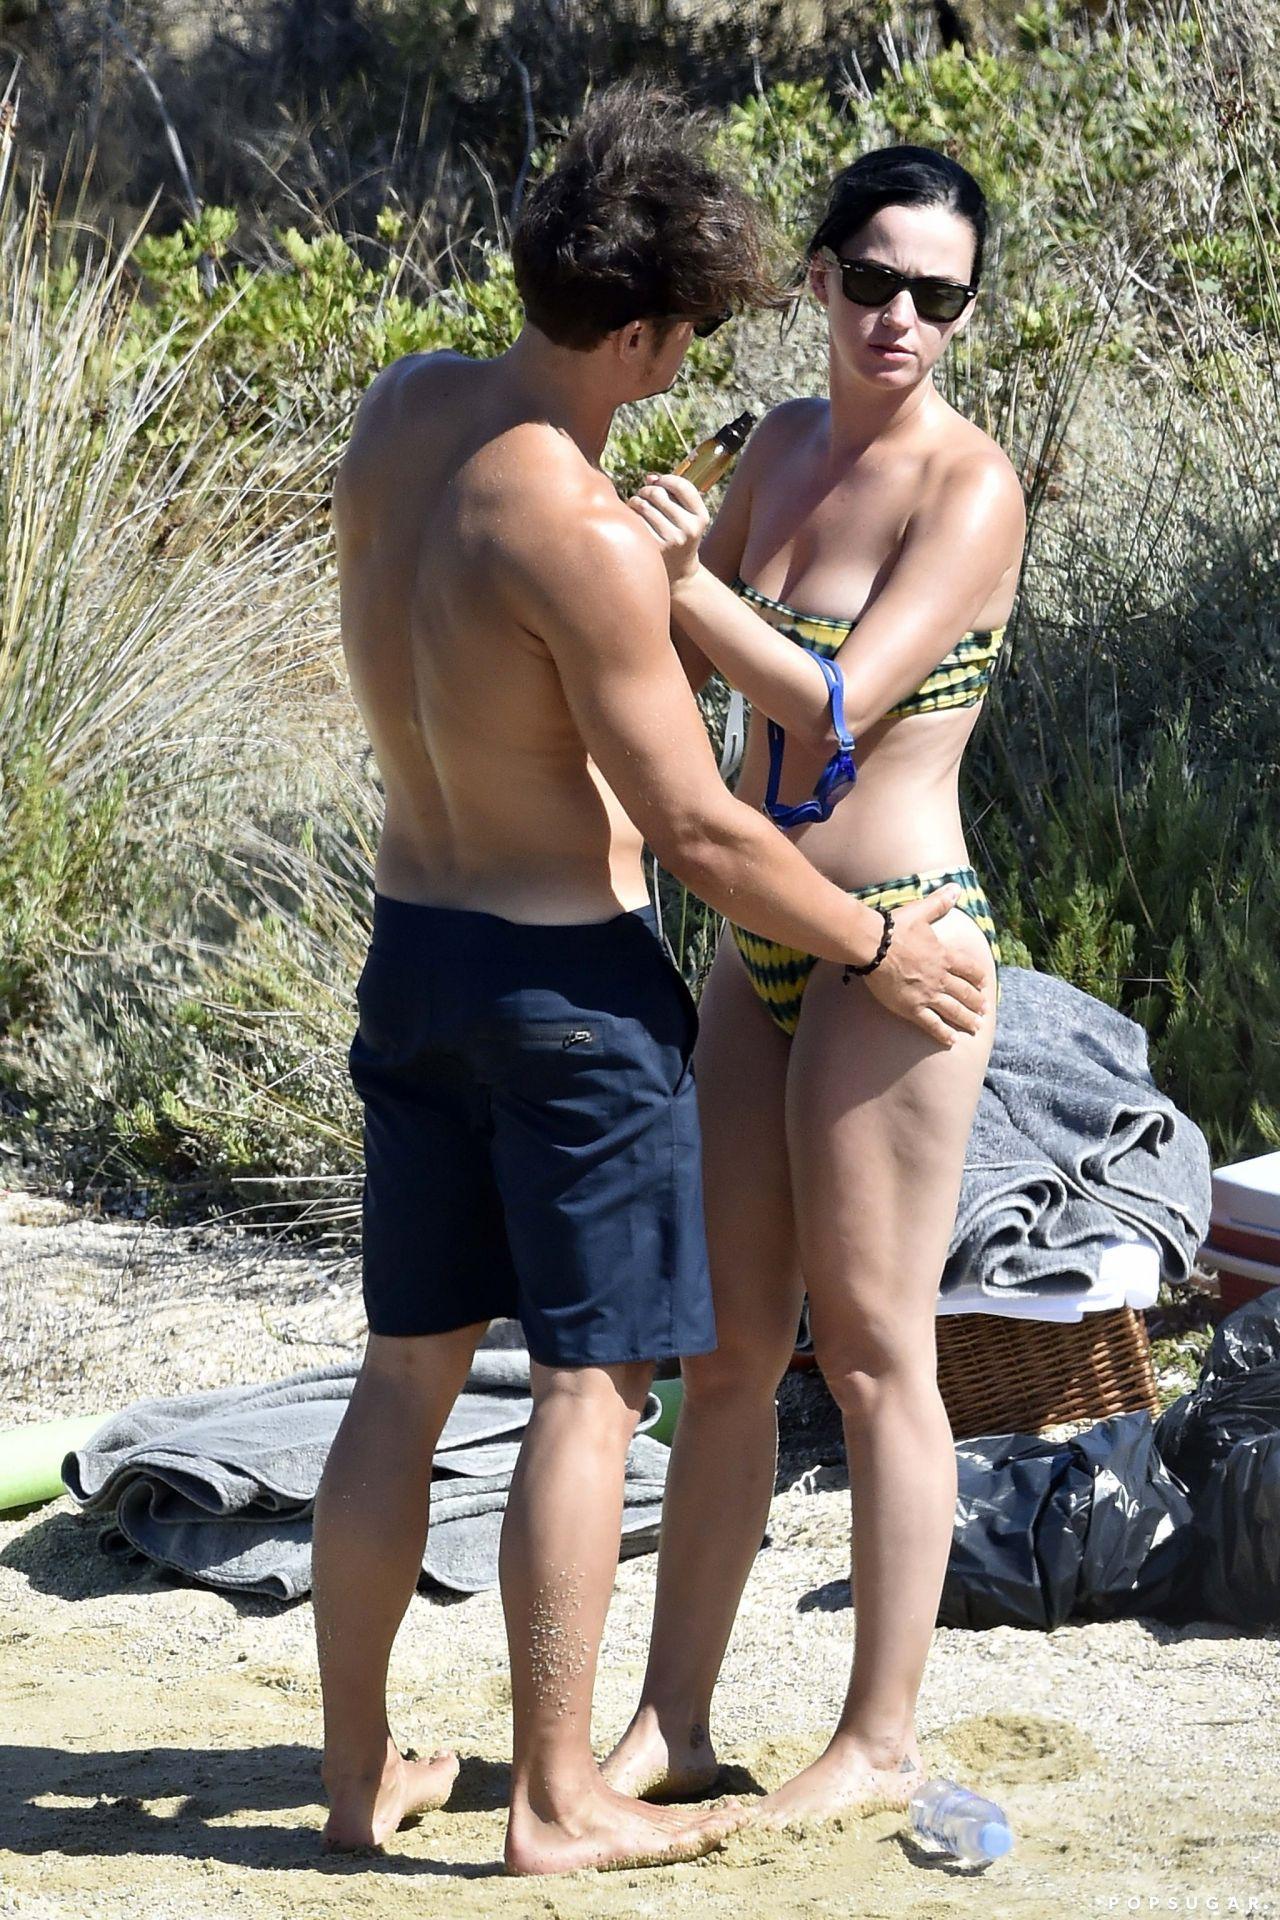 Katy Perry Bikini Photos - Beach In Italy 832016-2016